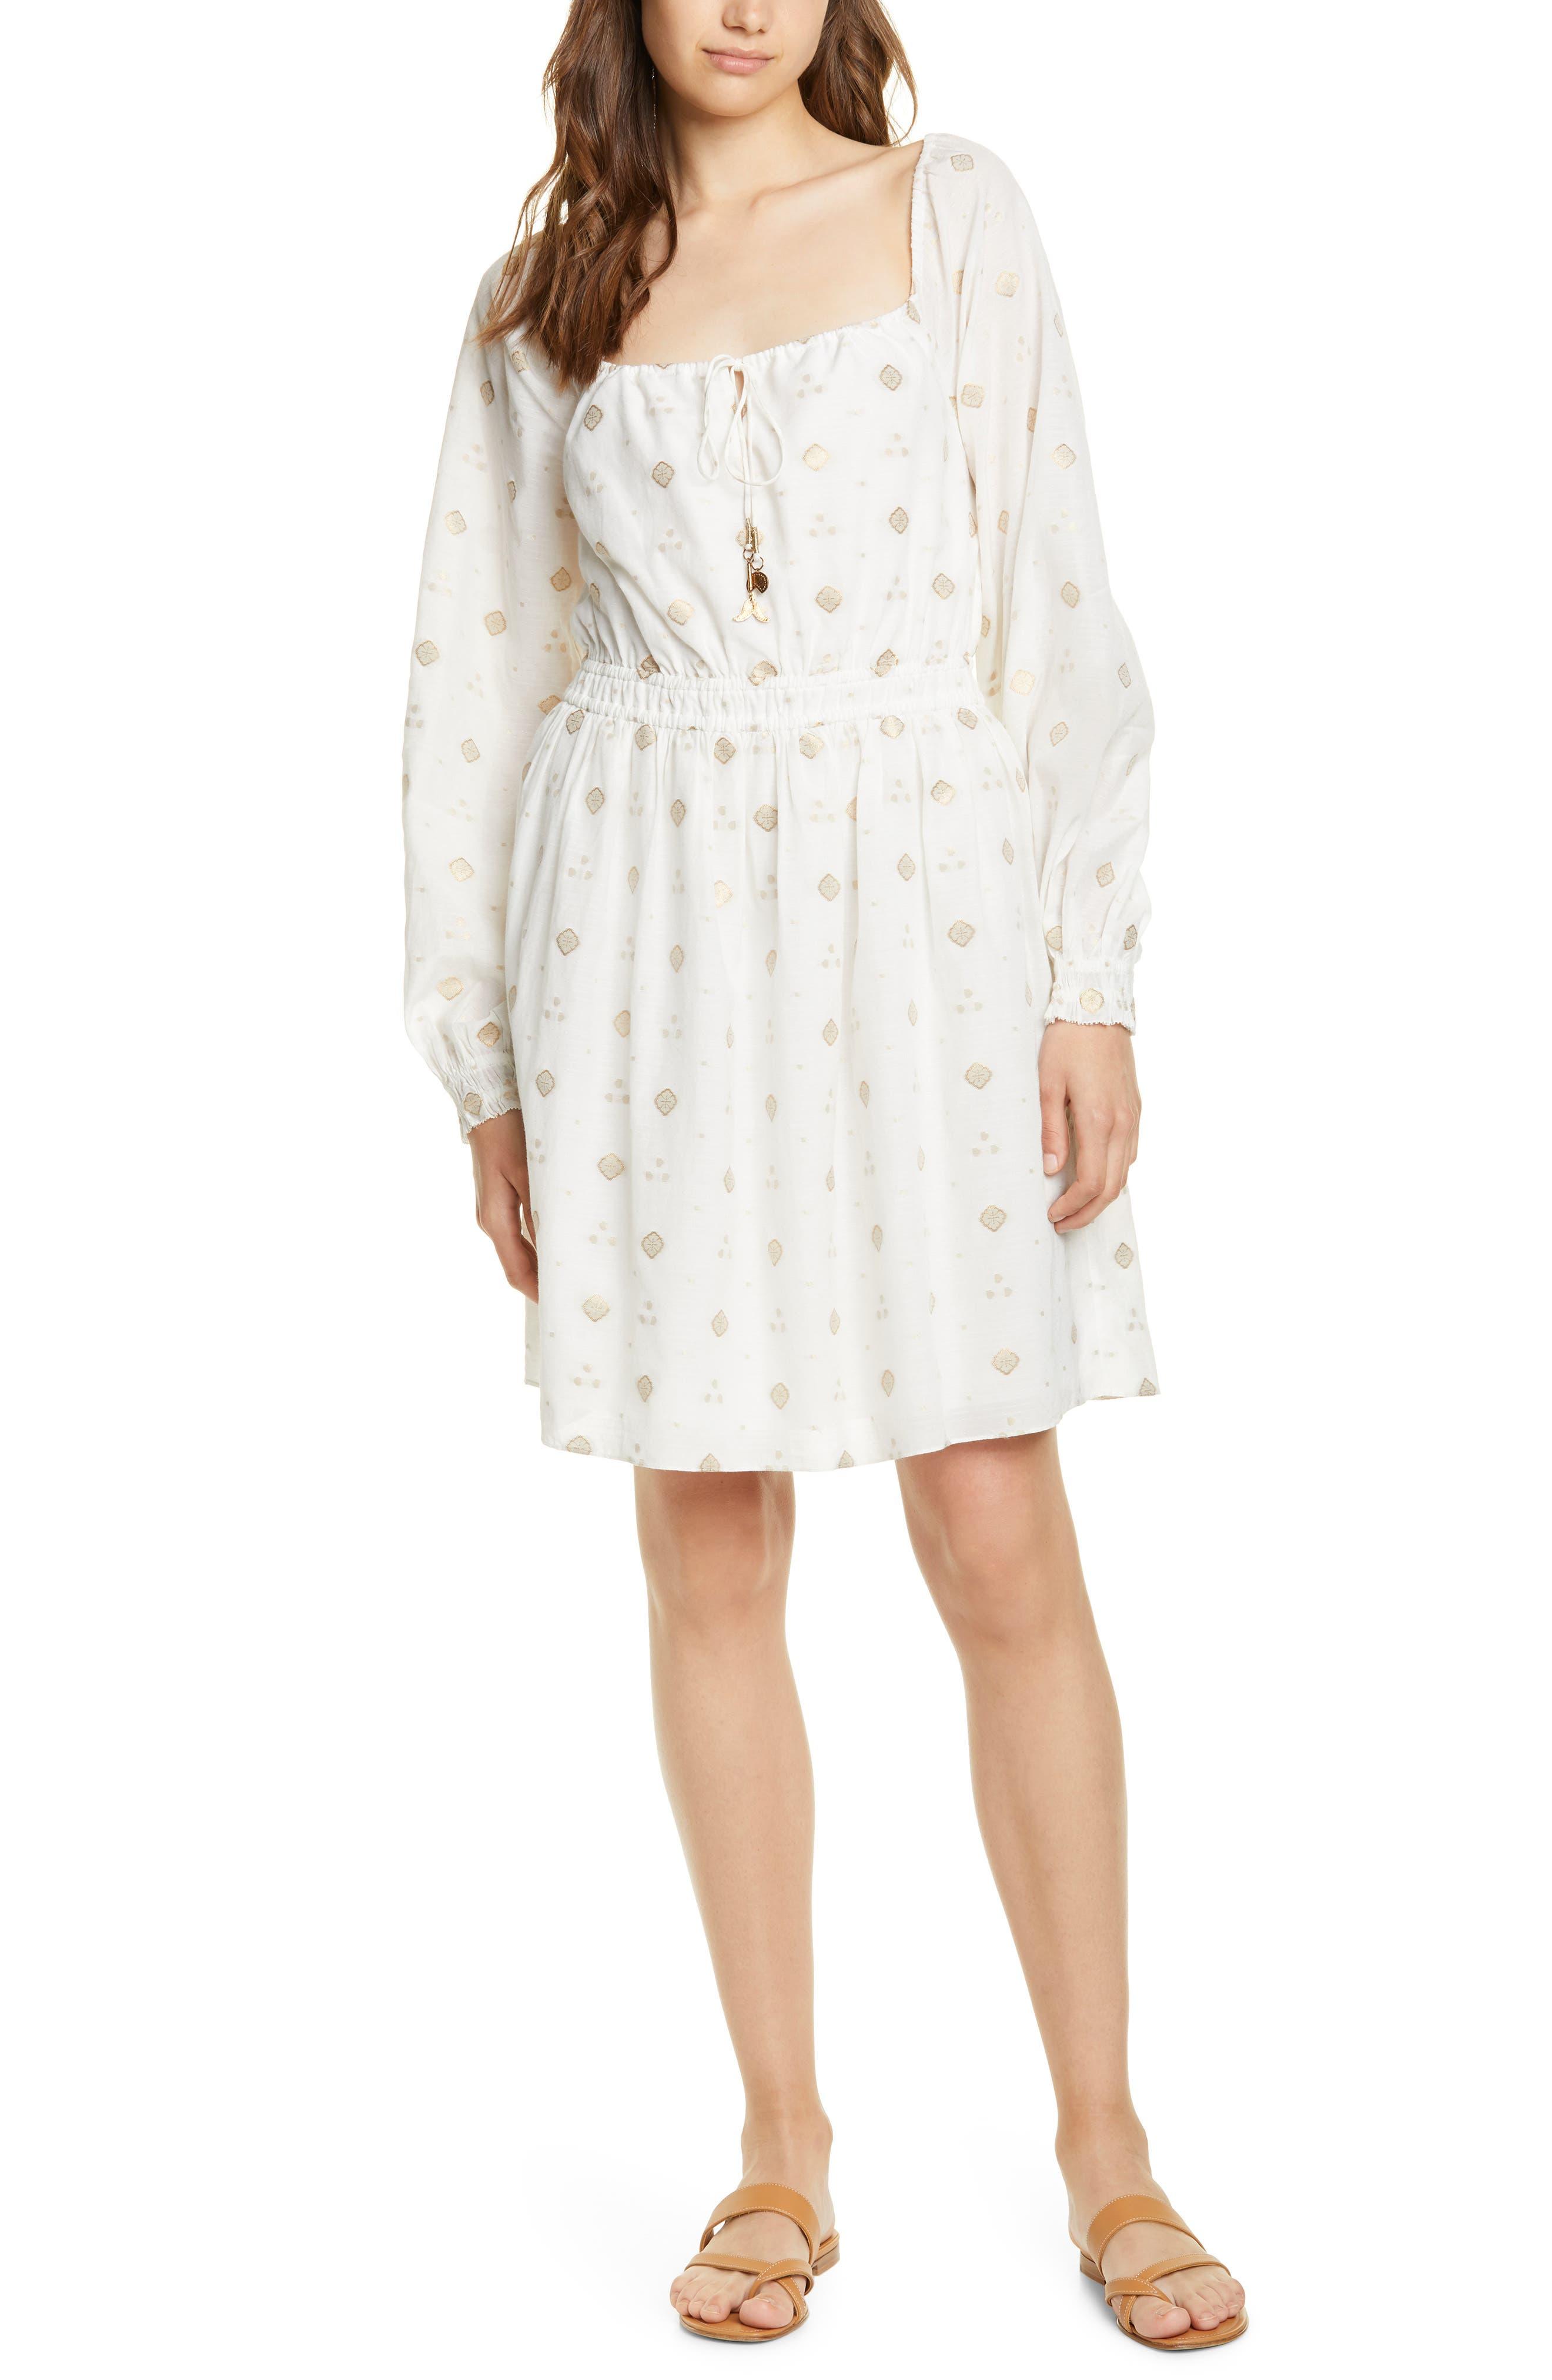 Joie Metallic Dot Long Sleeve Dress, White